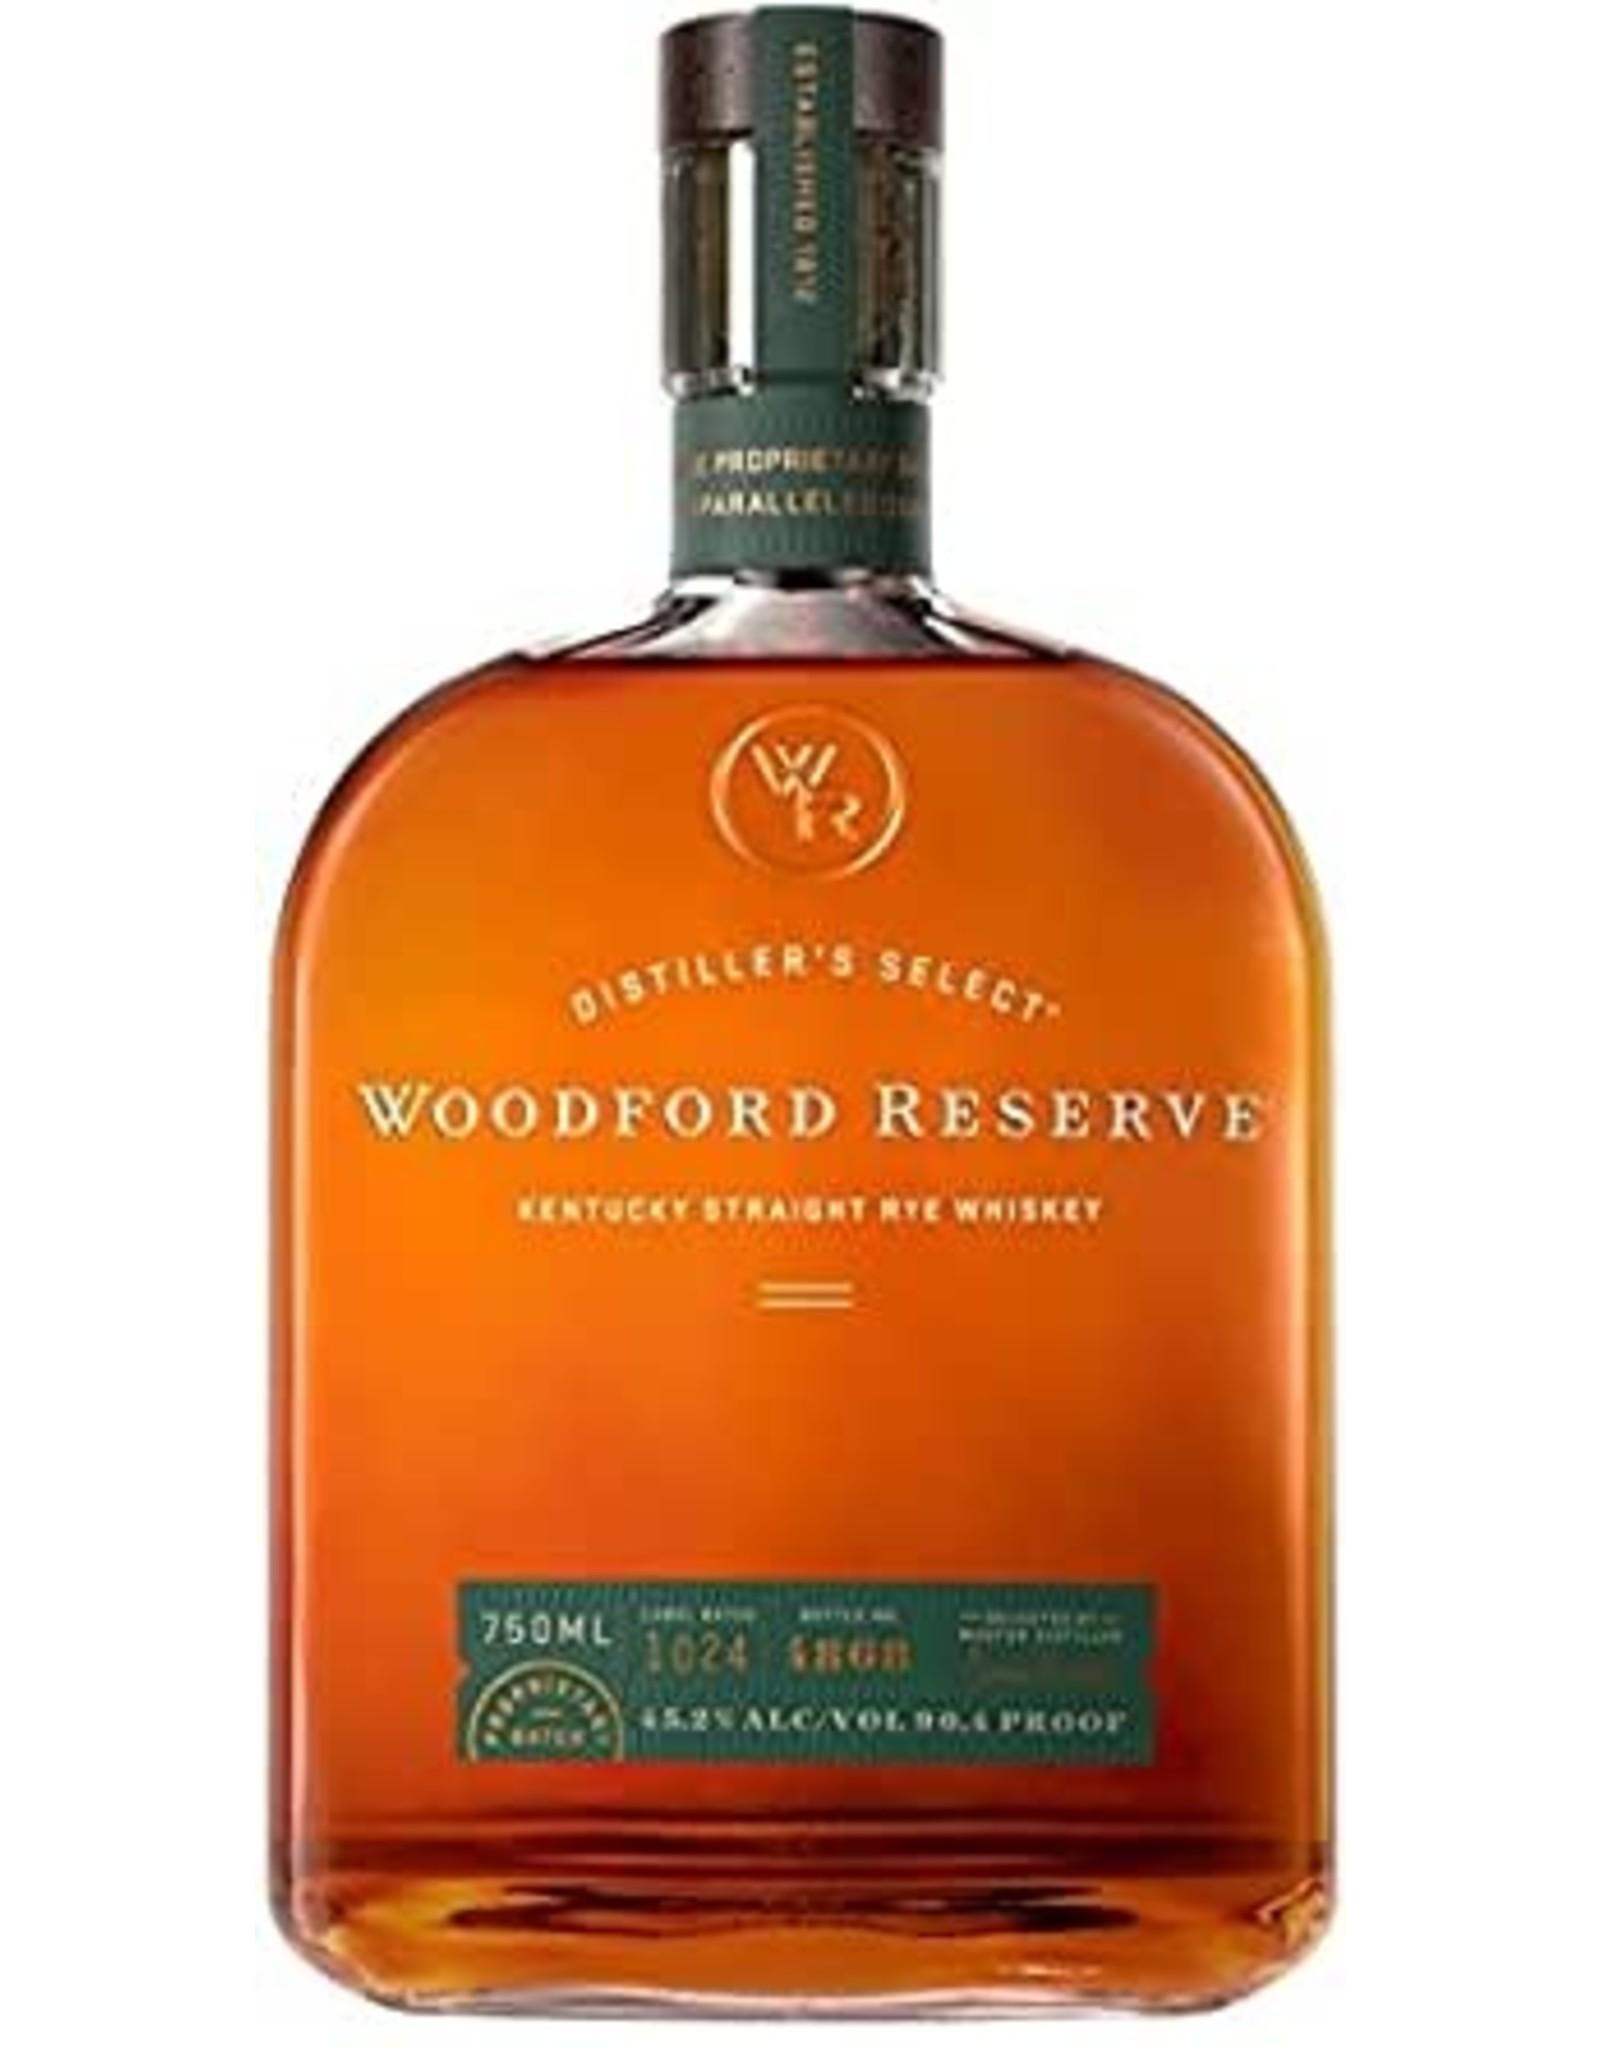 Woodford Reserve Rye